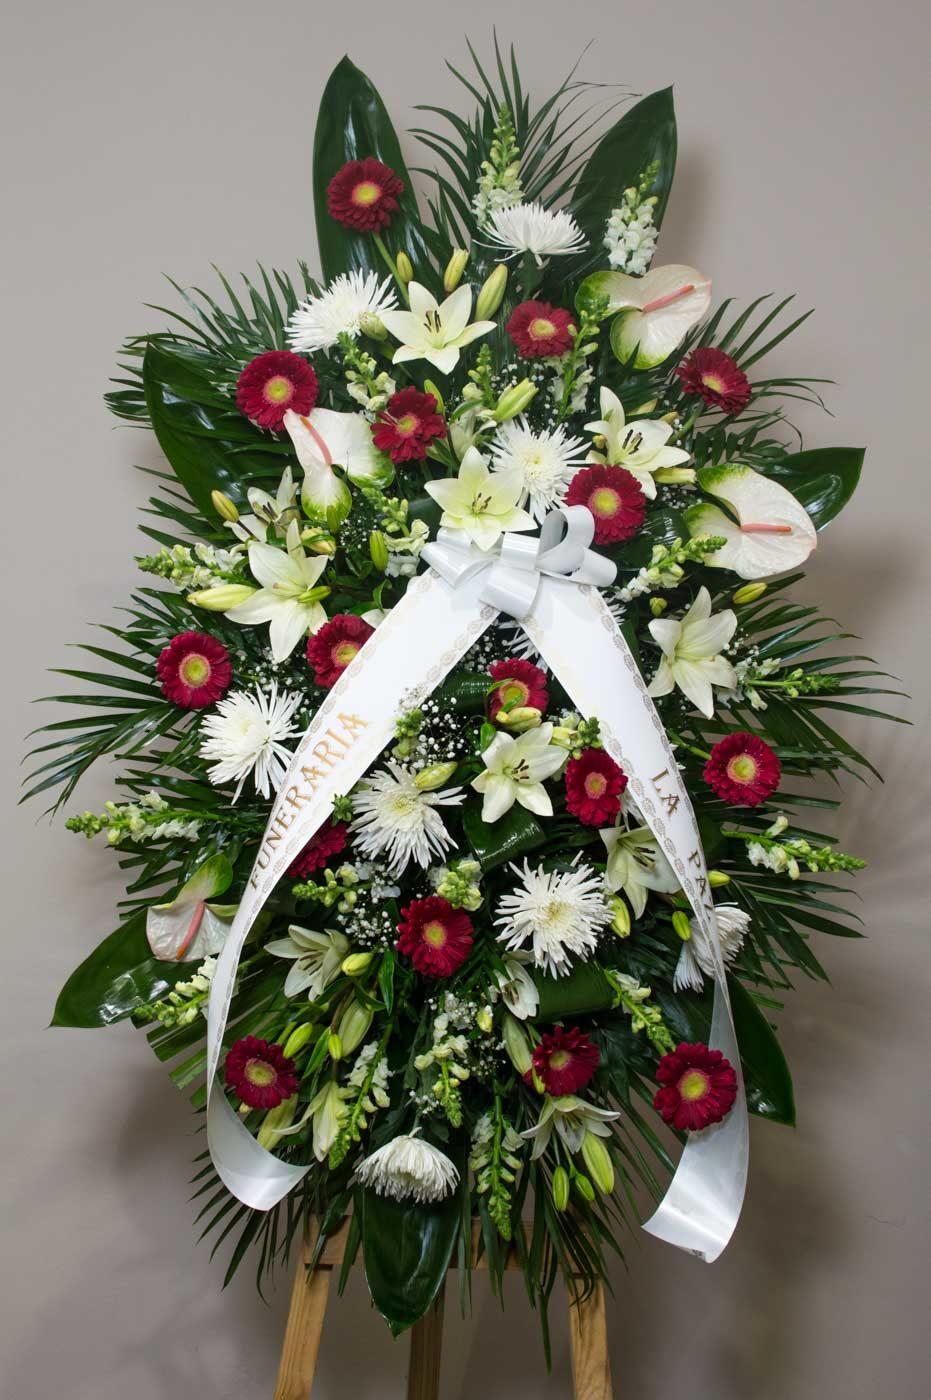 Centro colgante de flores variadas - Funeraria La Paz Verín